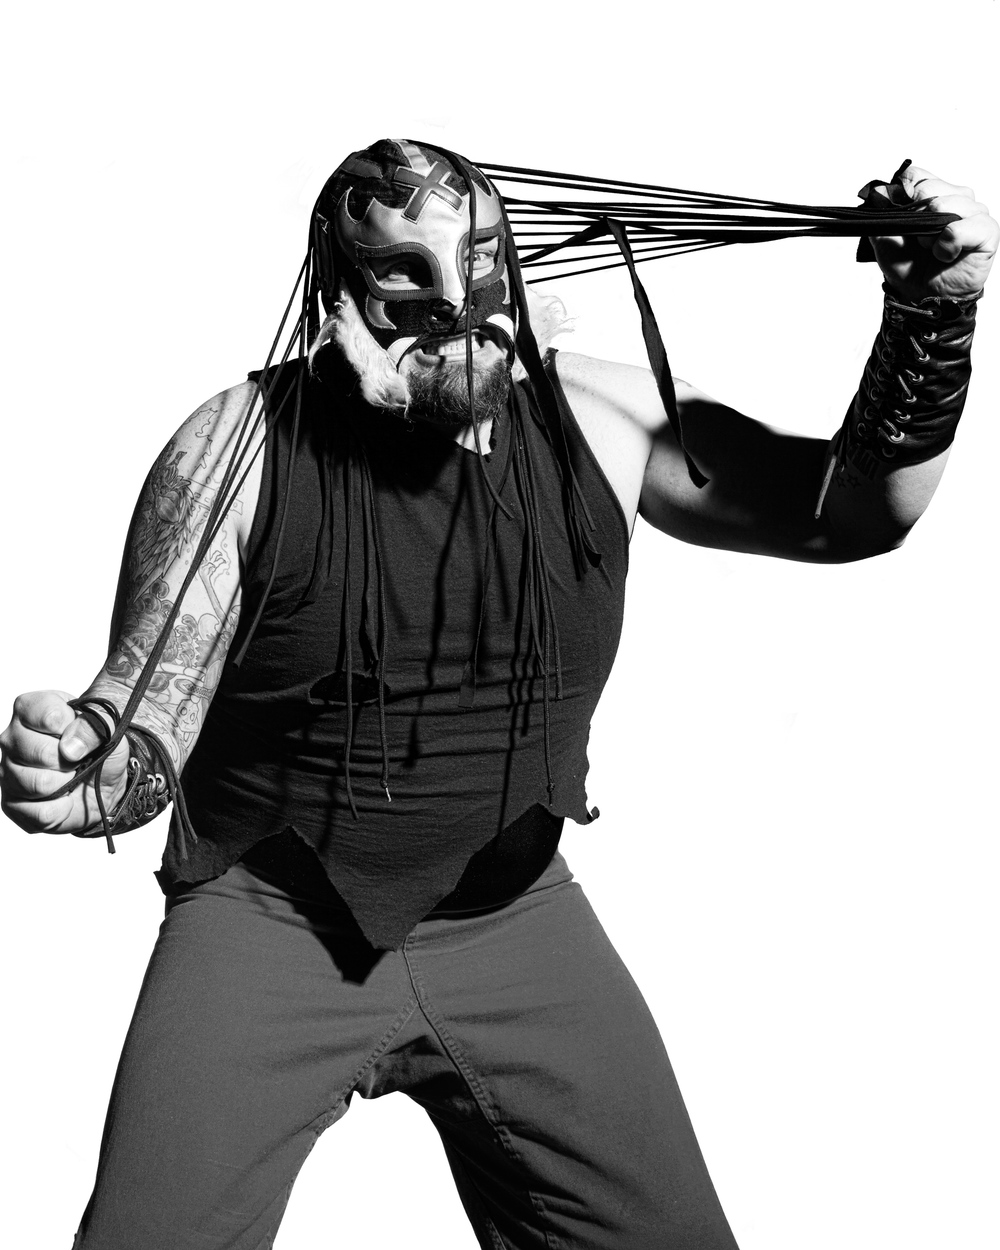 130420_Wrestling_IWI_JustinAnderson-157_Final.jpg